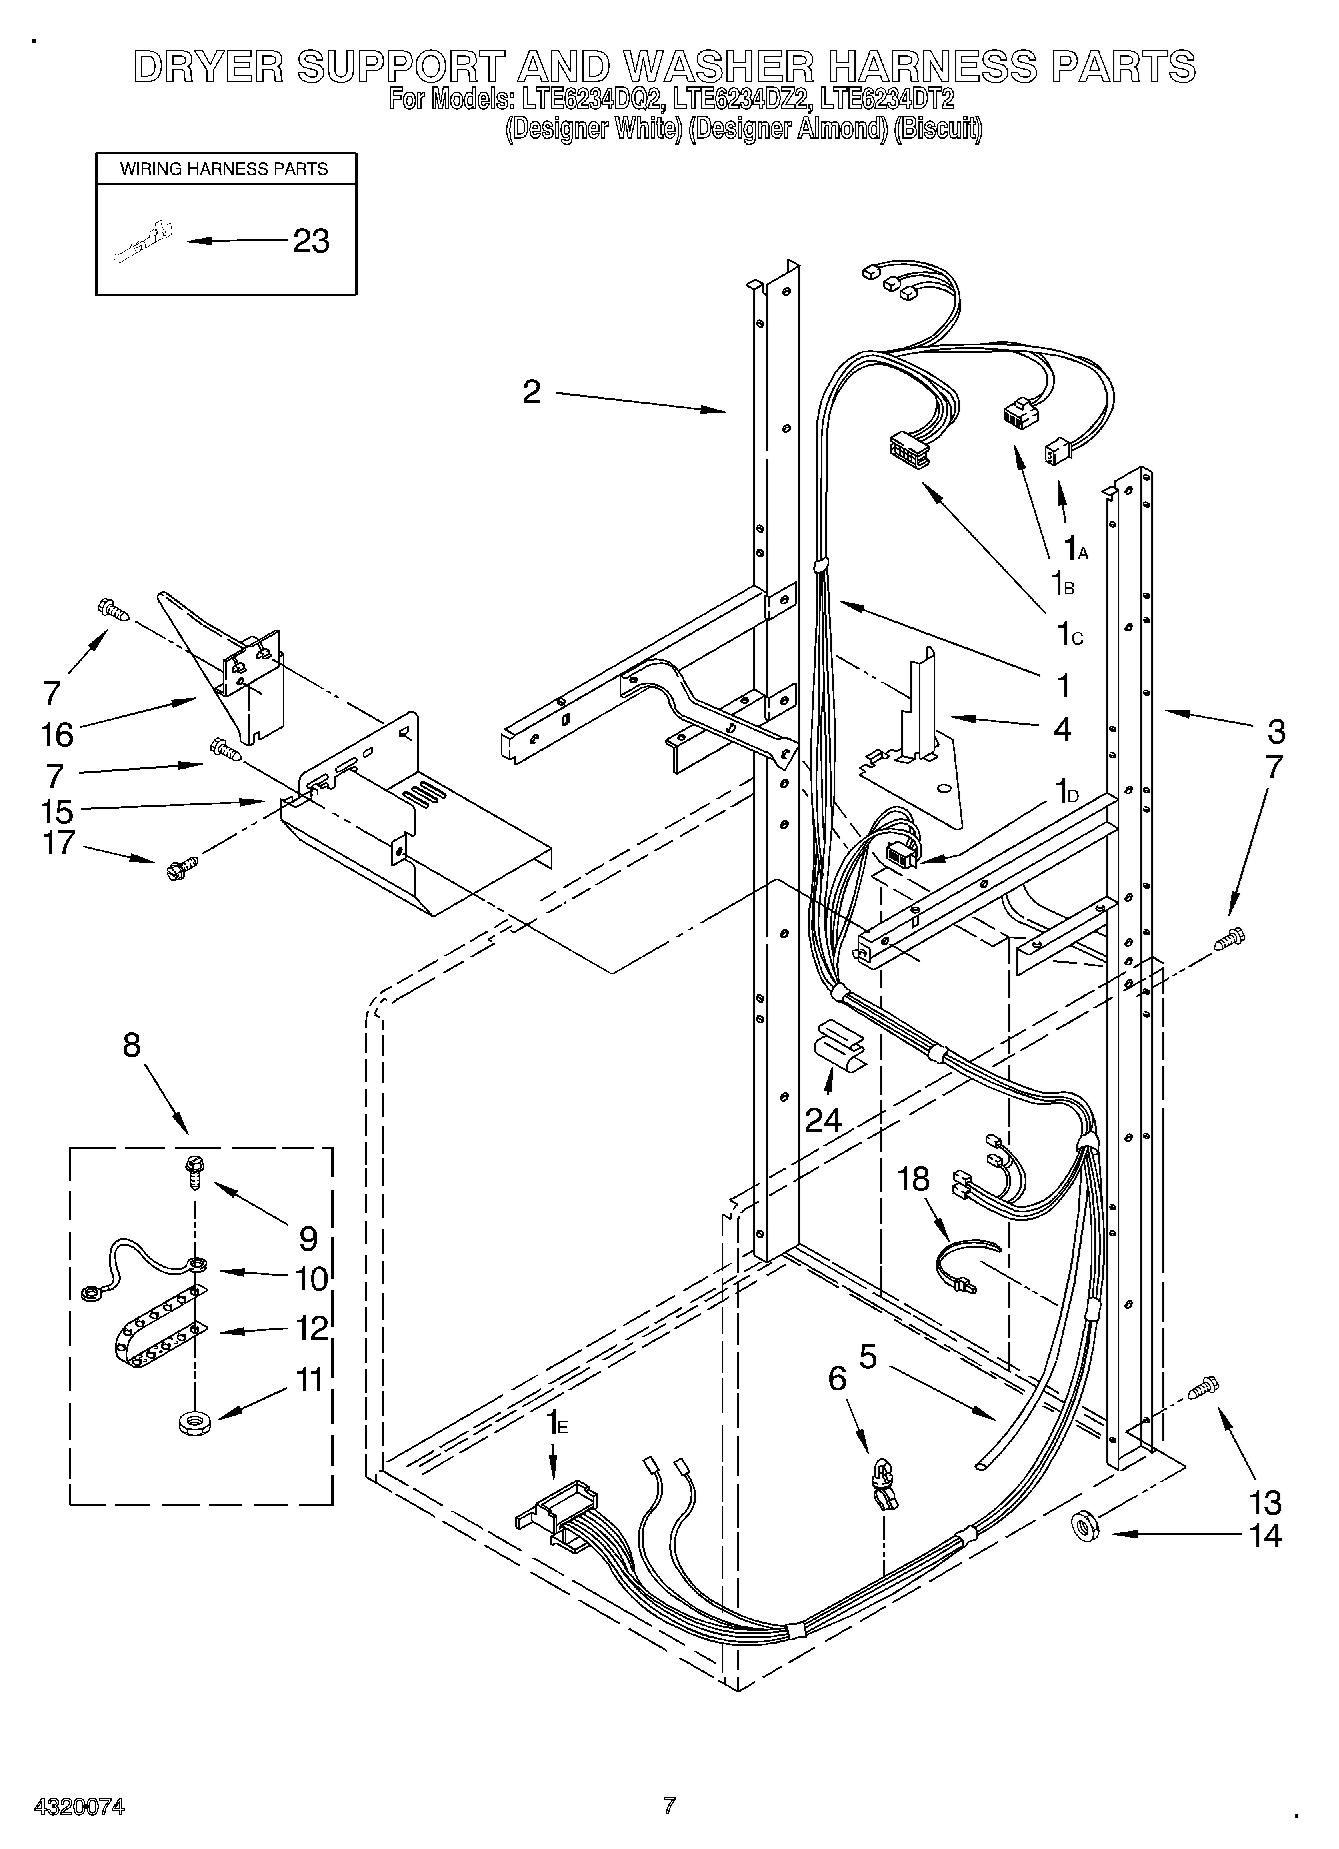 WhirlpoolImg_19000101 20150716_00160233?width\\\=1000 astralpool wiring diagrams gandul 45 77 79 119  at cos-gaming.co